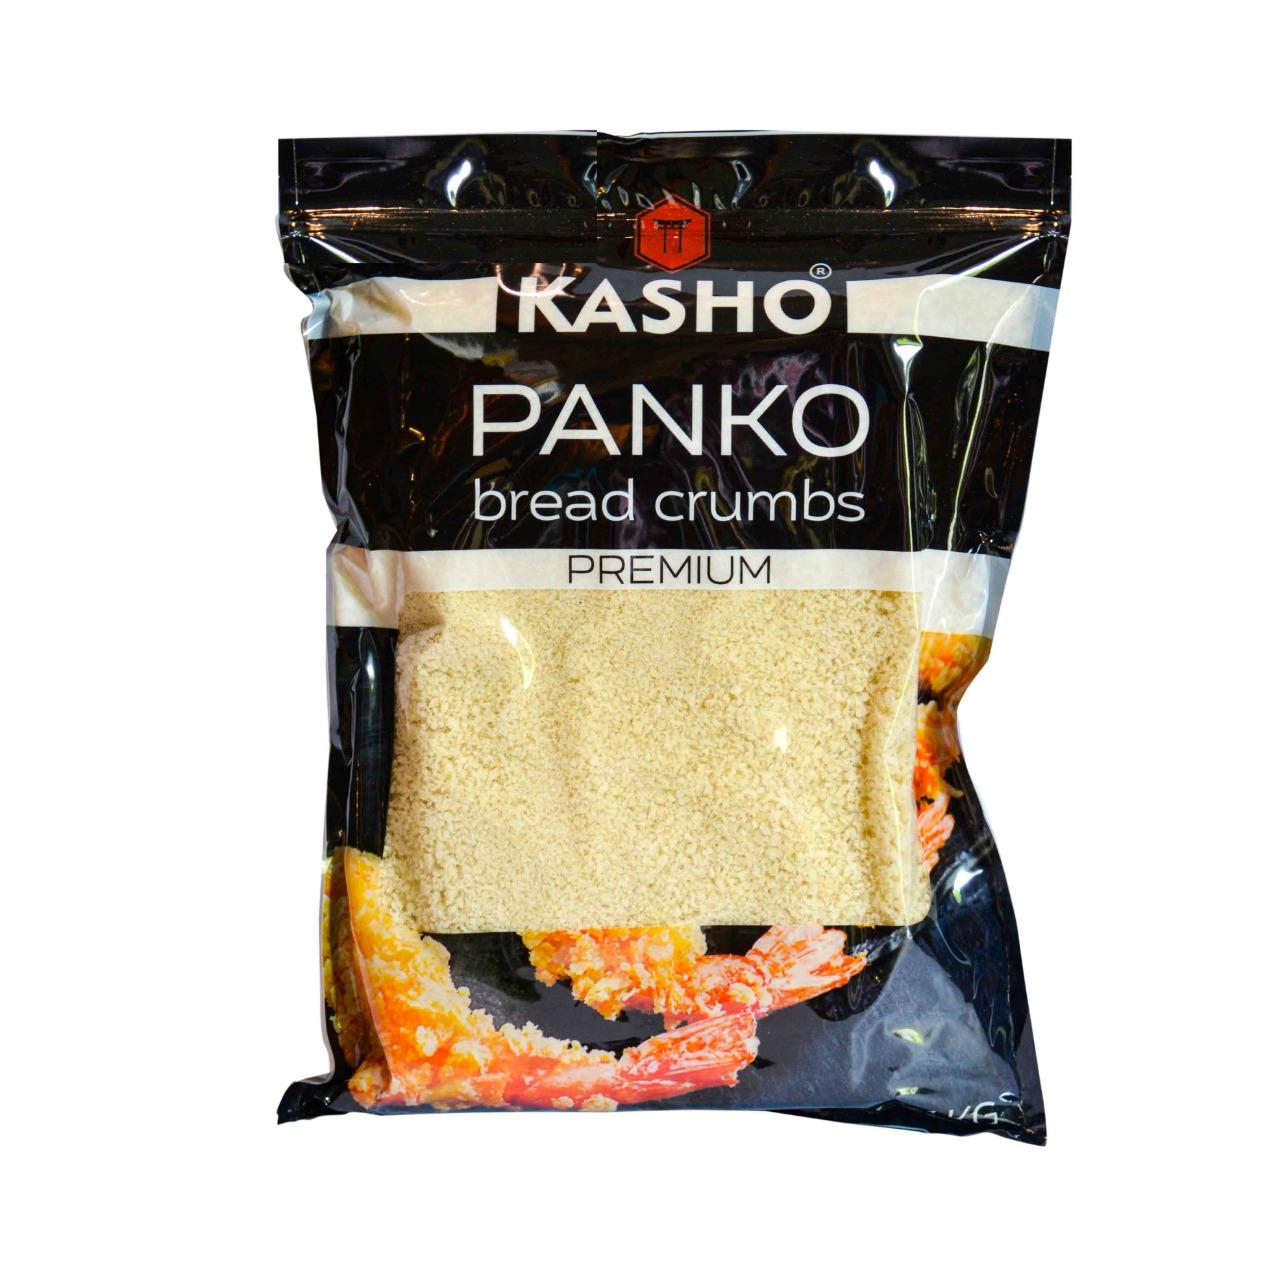 Bred Crumbs Premium Panko Kasho 1kg.